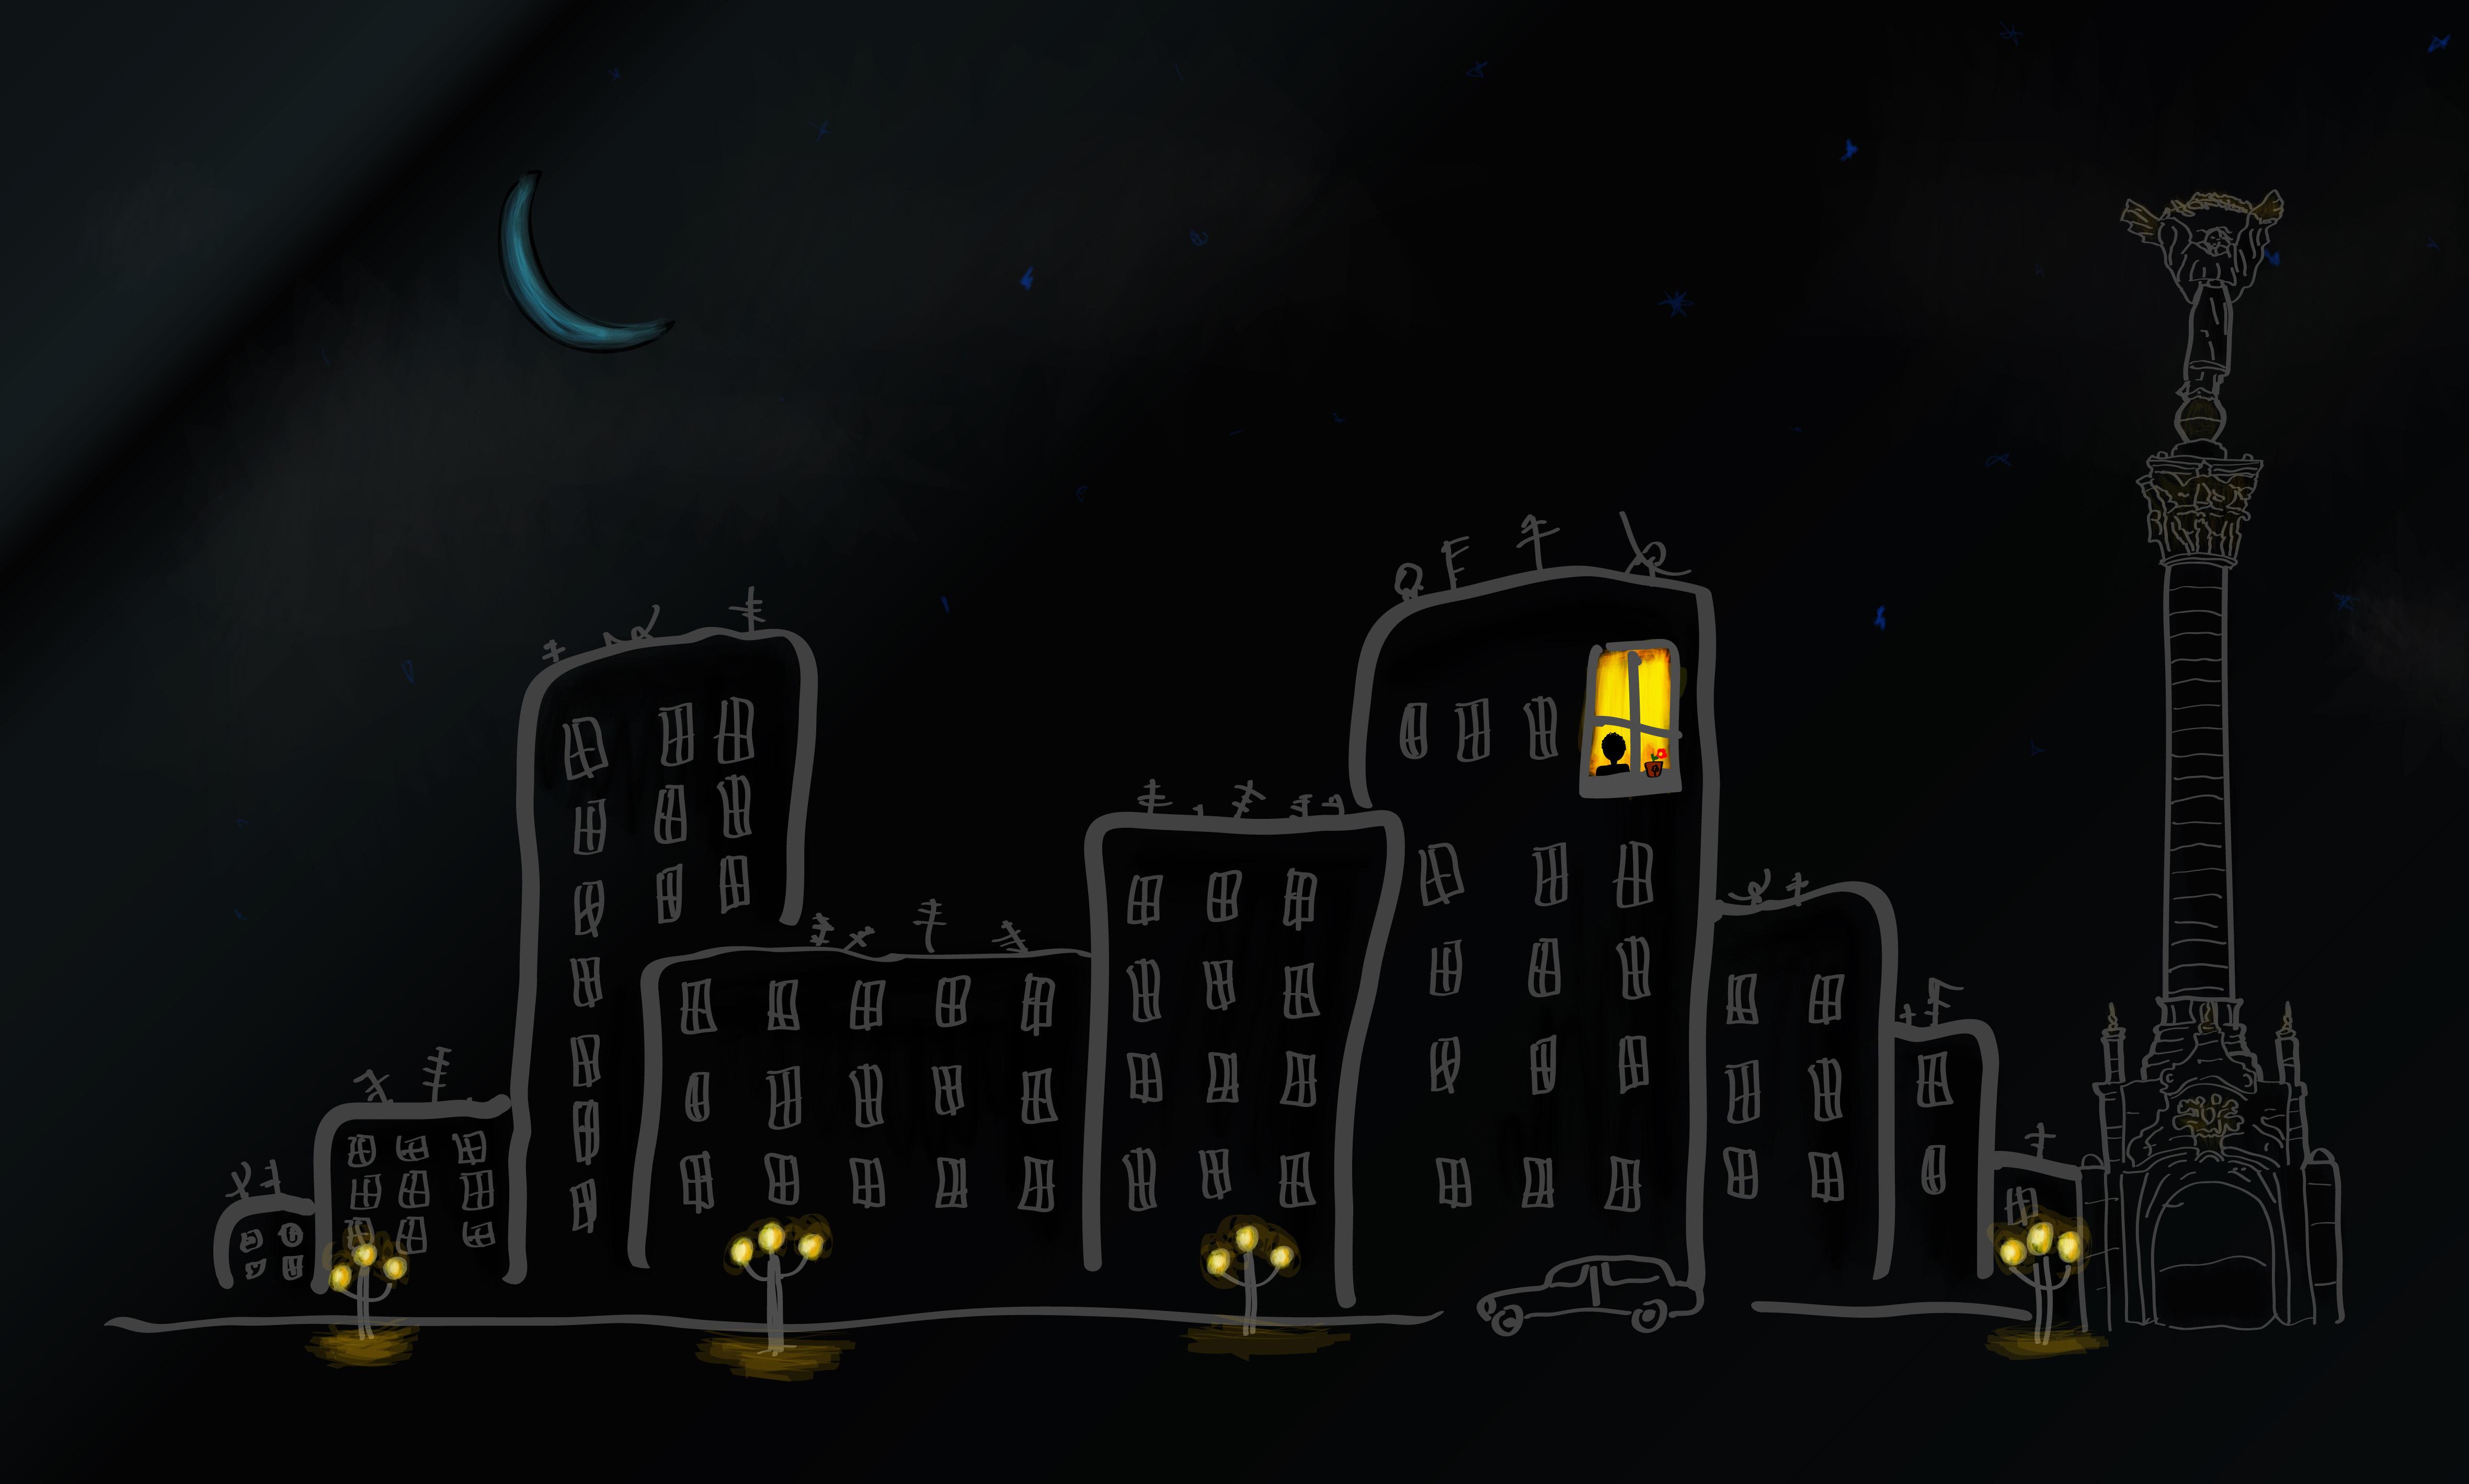 Best Wallpaper Night Cartoon - 490059c652cbe80ae51b98a185989a29  Image.jpg